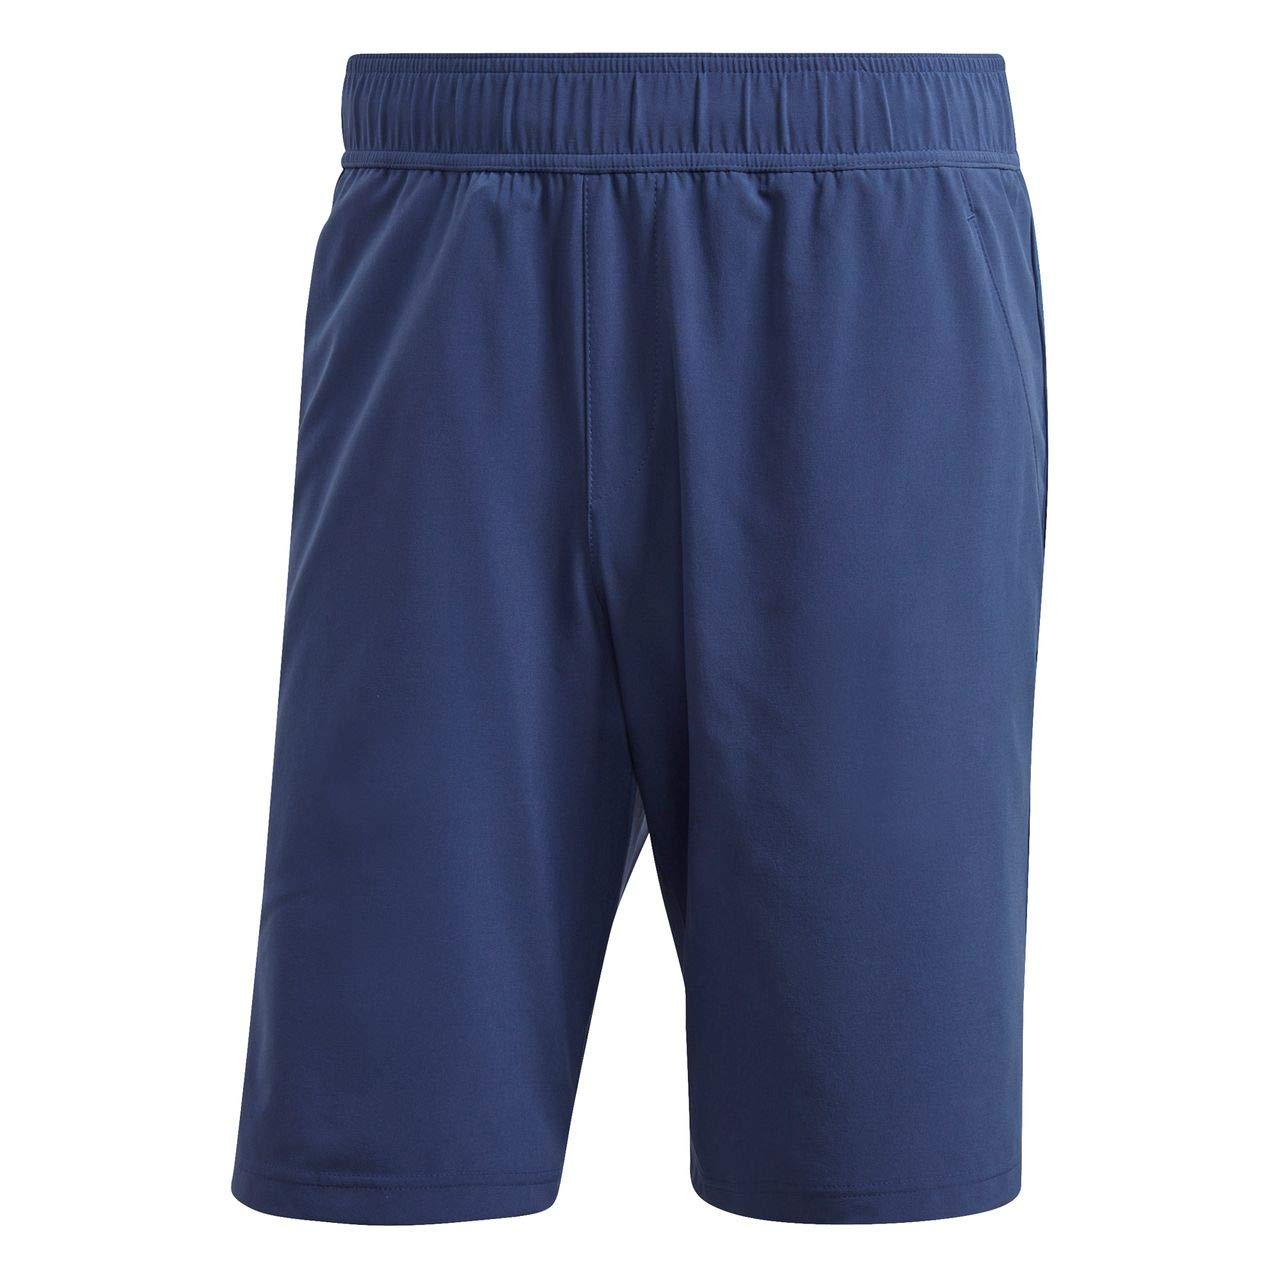 Adidas Herren Advantage Shorts, Nobind, M B07DBZTF48 Tennisschuhe König König König der Menge 348186